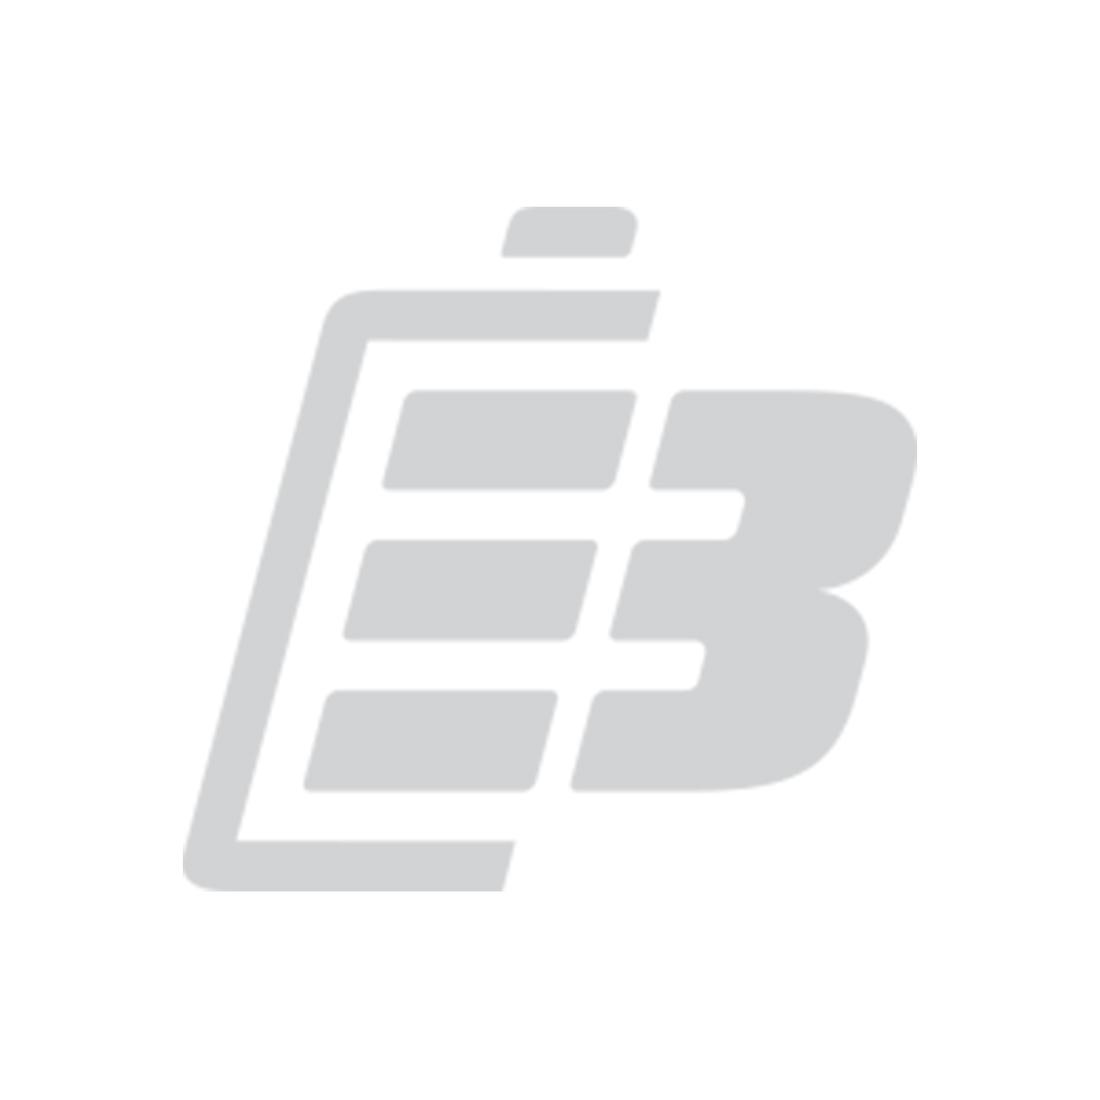 Fenix HL18R-T Lightweight Headlamp